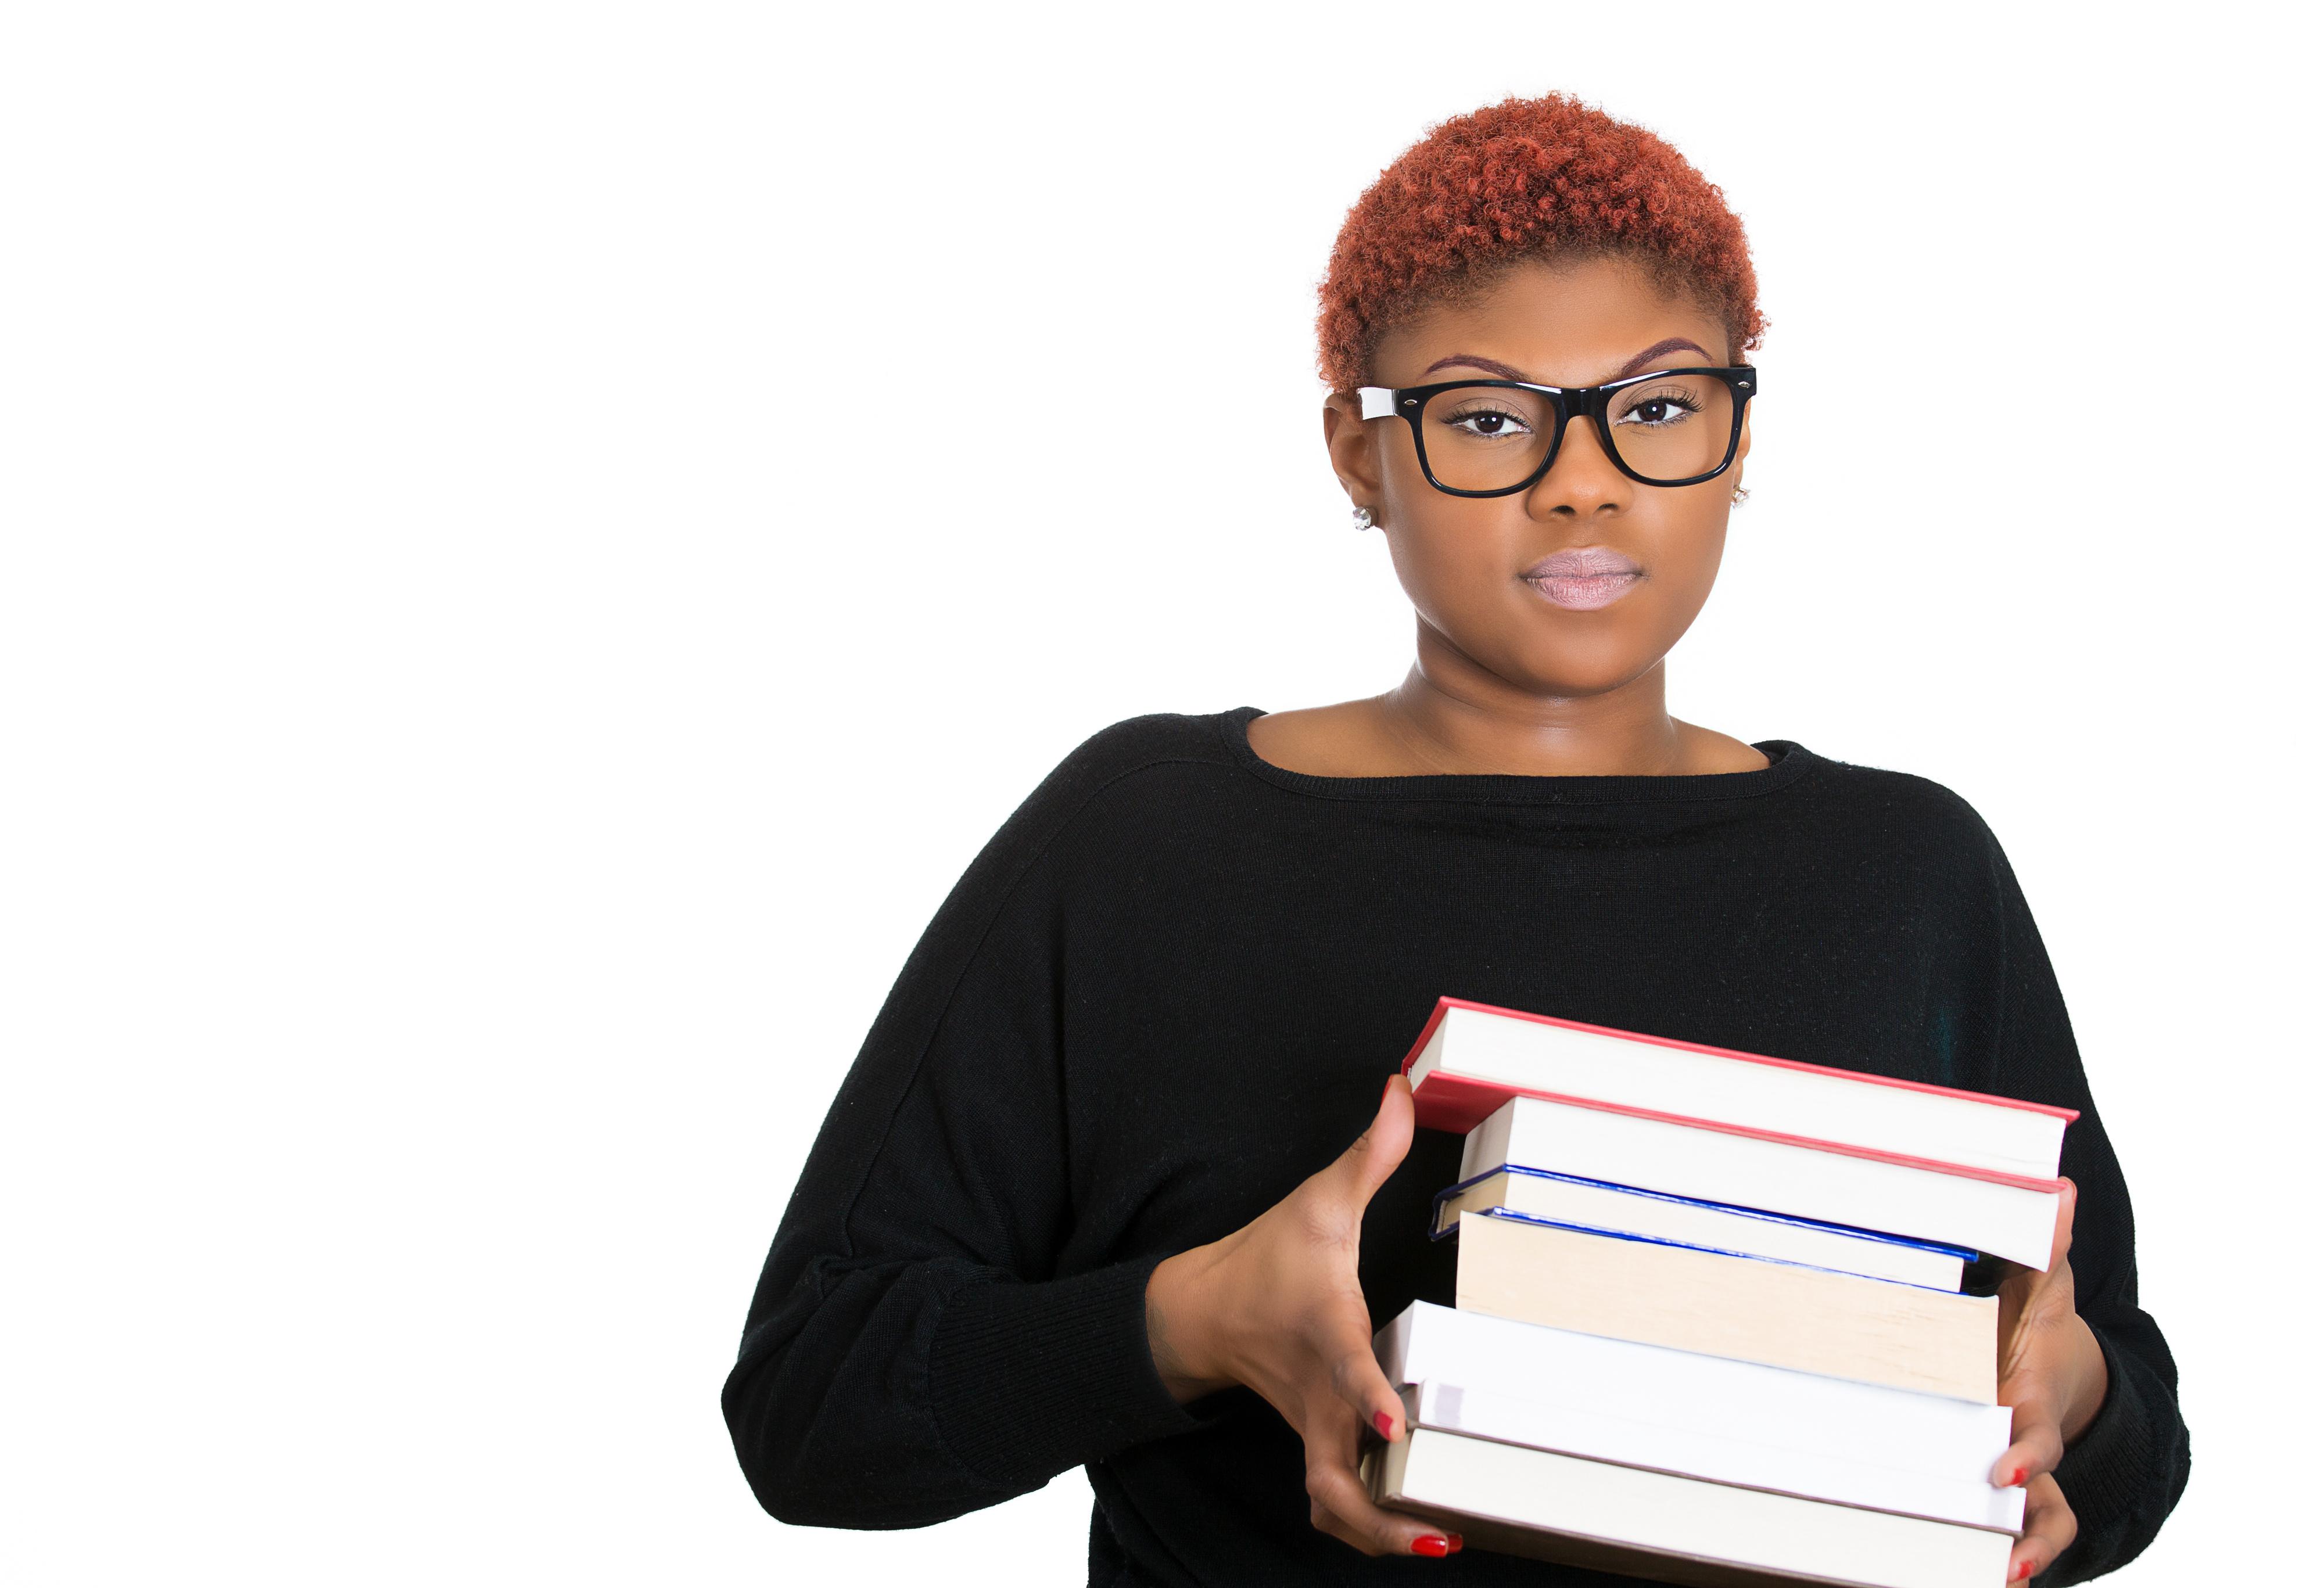 Ebony Sistahs & Ivory Towers: A Vital Call for Black Women Scholars